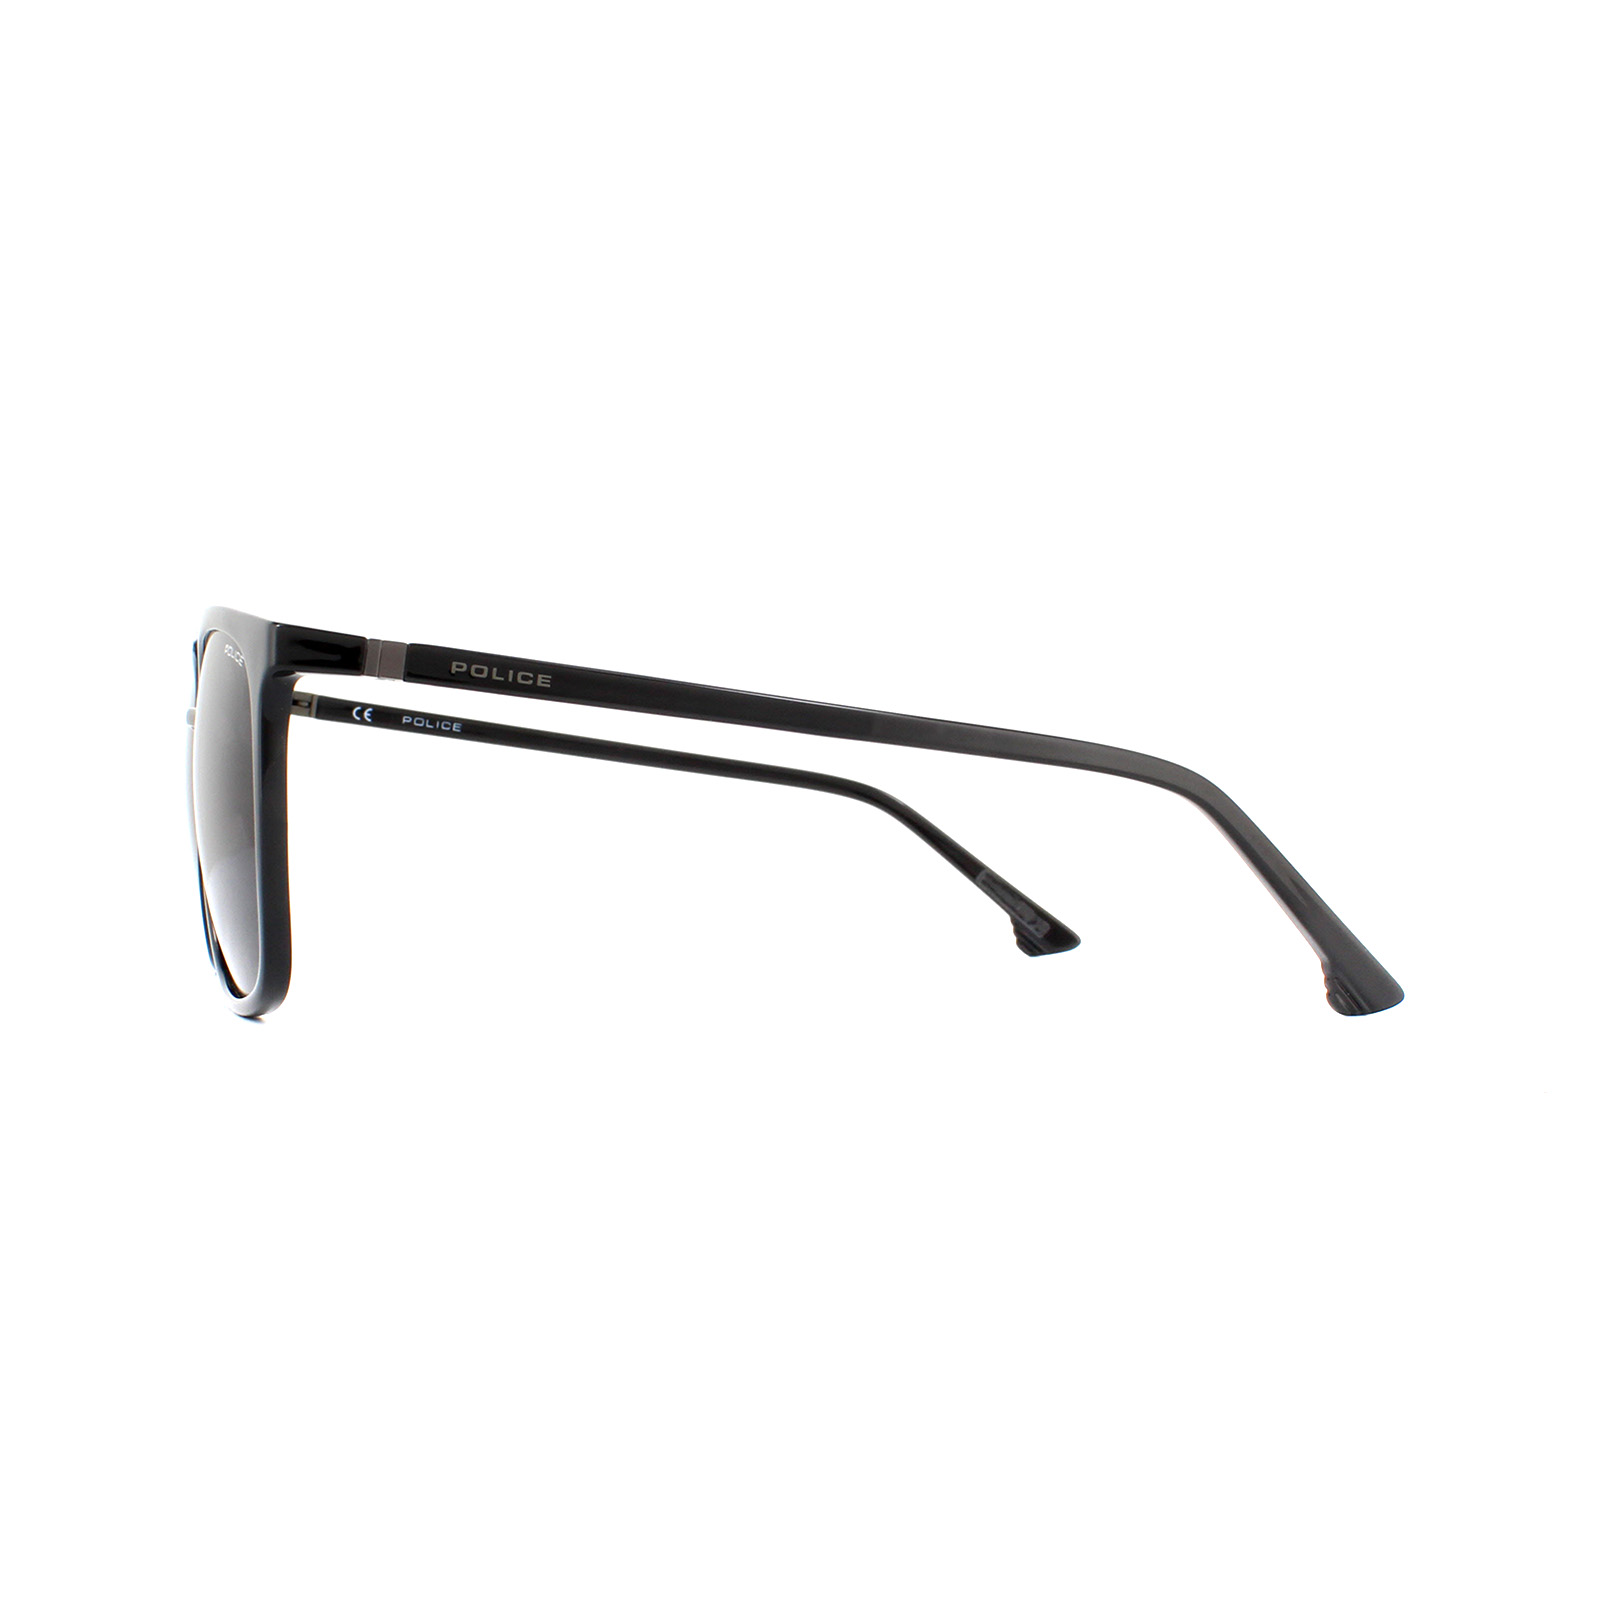 Police Sunglasses SPL342M Jungle 1 0Z42 Shiny Black Smoke Grey